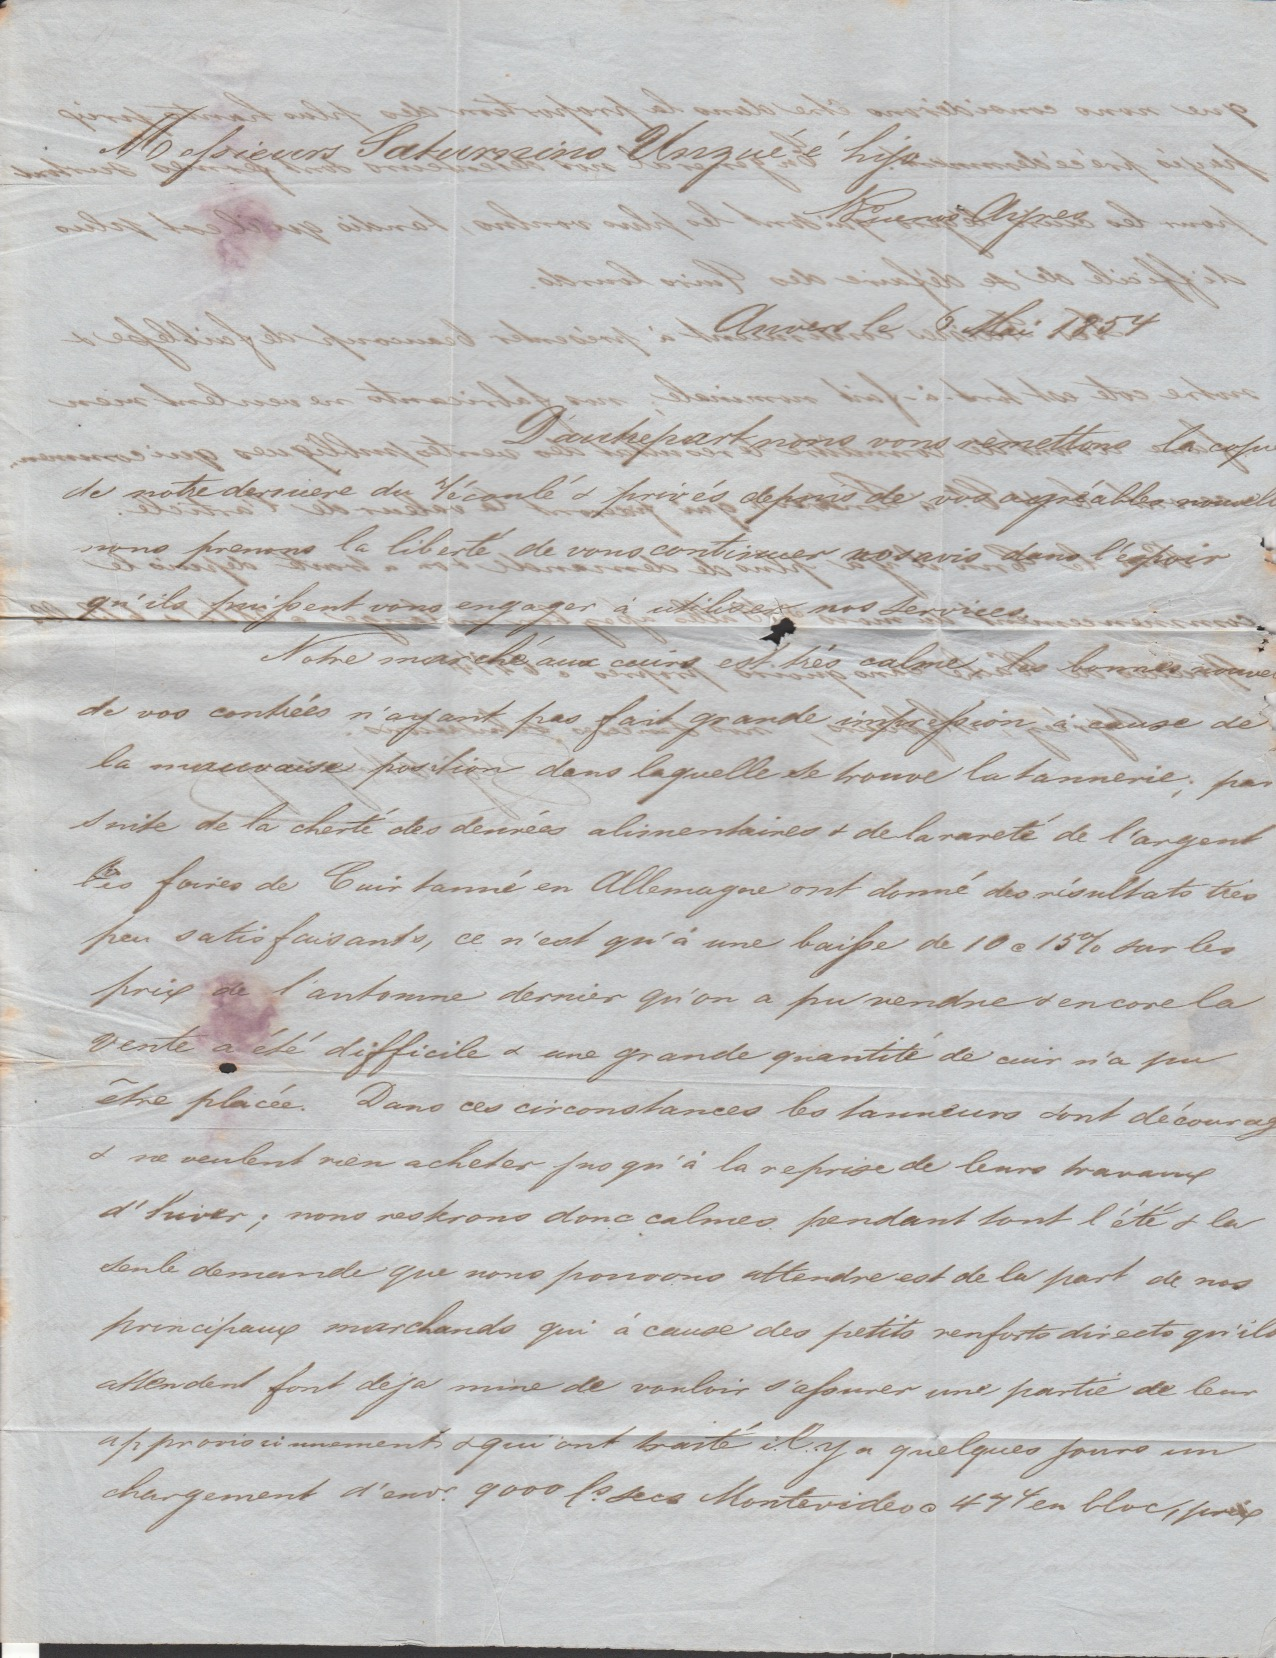 G.B. - London / Forwarding Agents 1854 - Image 3 of 4